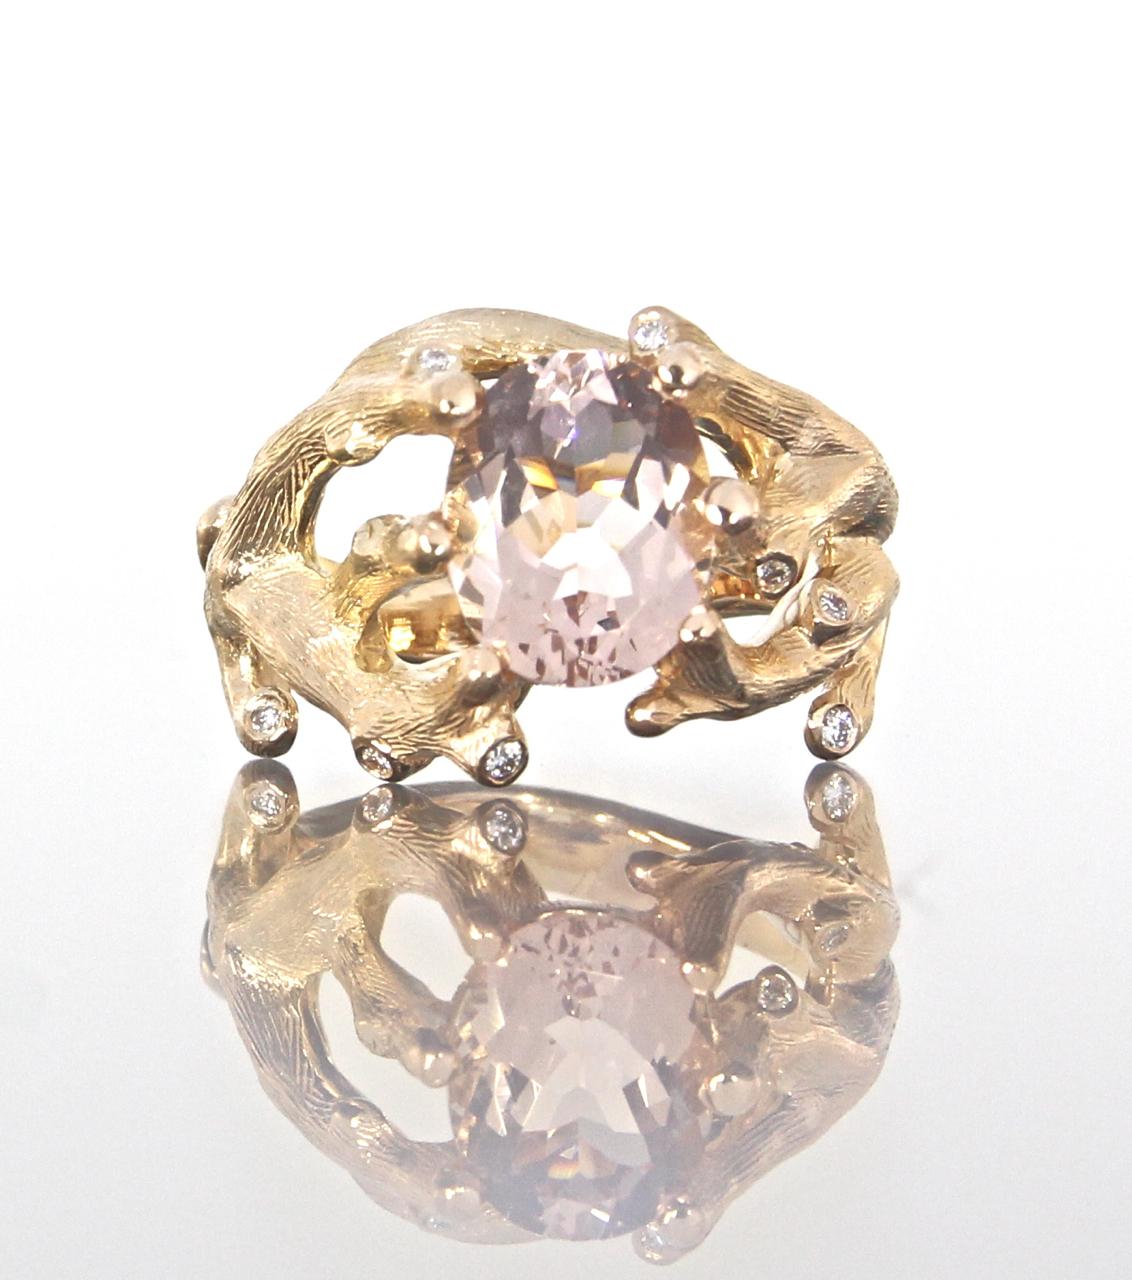 unique-oval-cut-morganite-diamond-alternative-engagement-ring-craft-revival-jewelry-store-grand-rapids